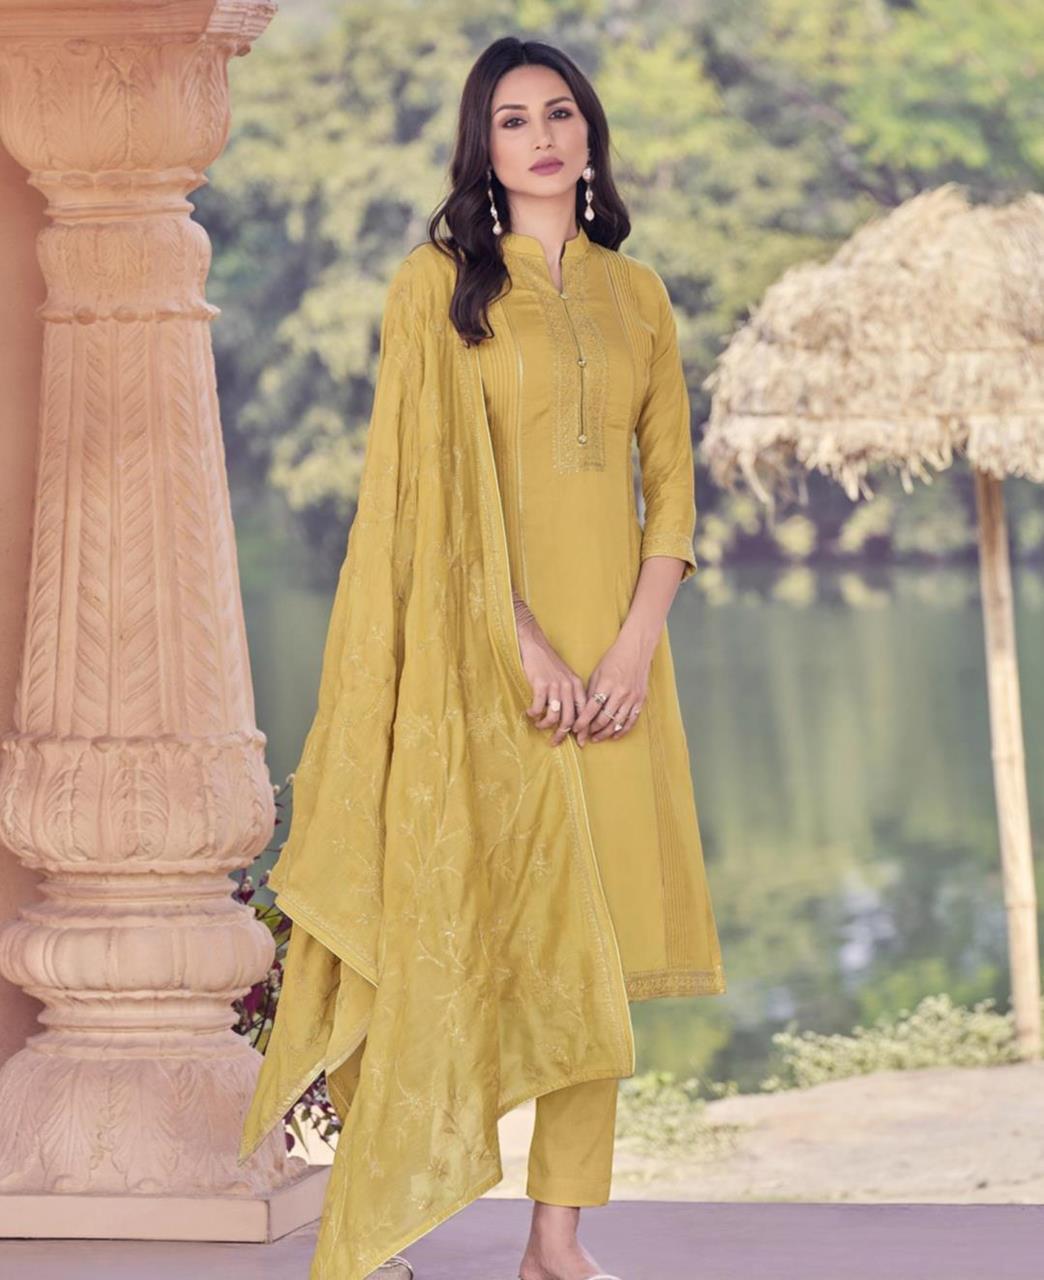 Zari Cotton Straight cut Salwar Kameez in Musterd